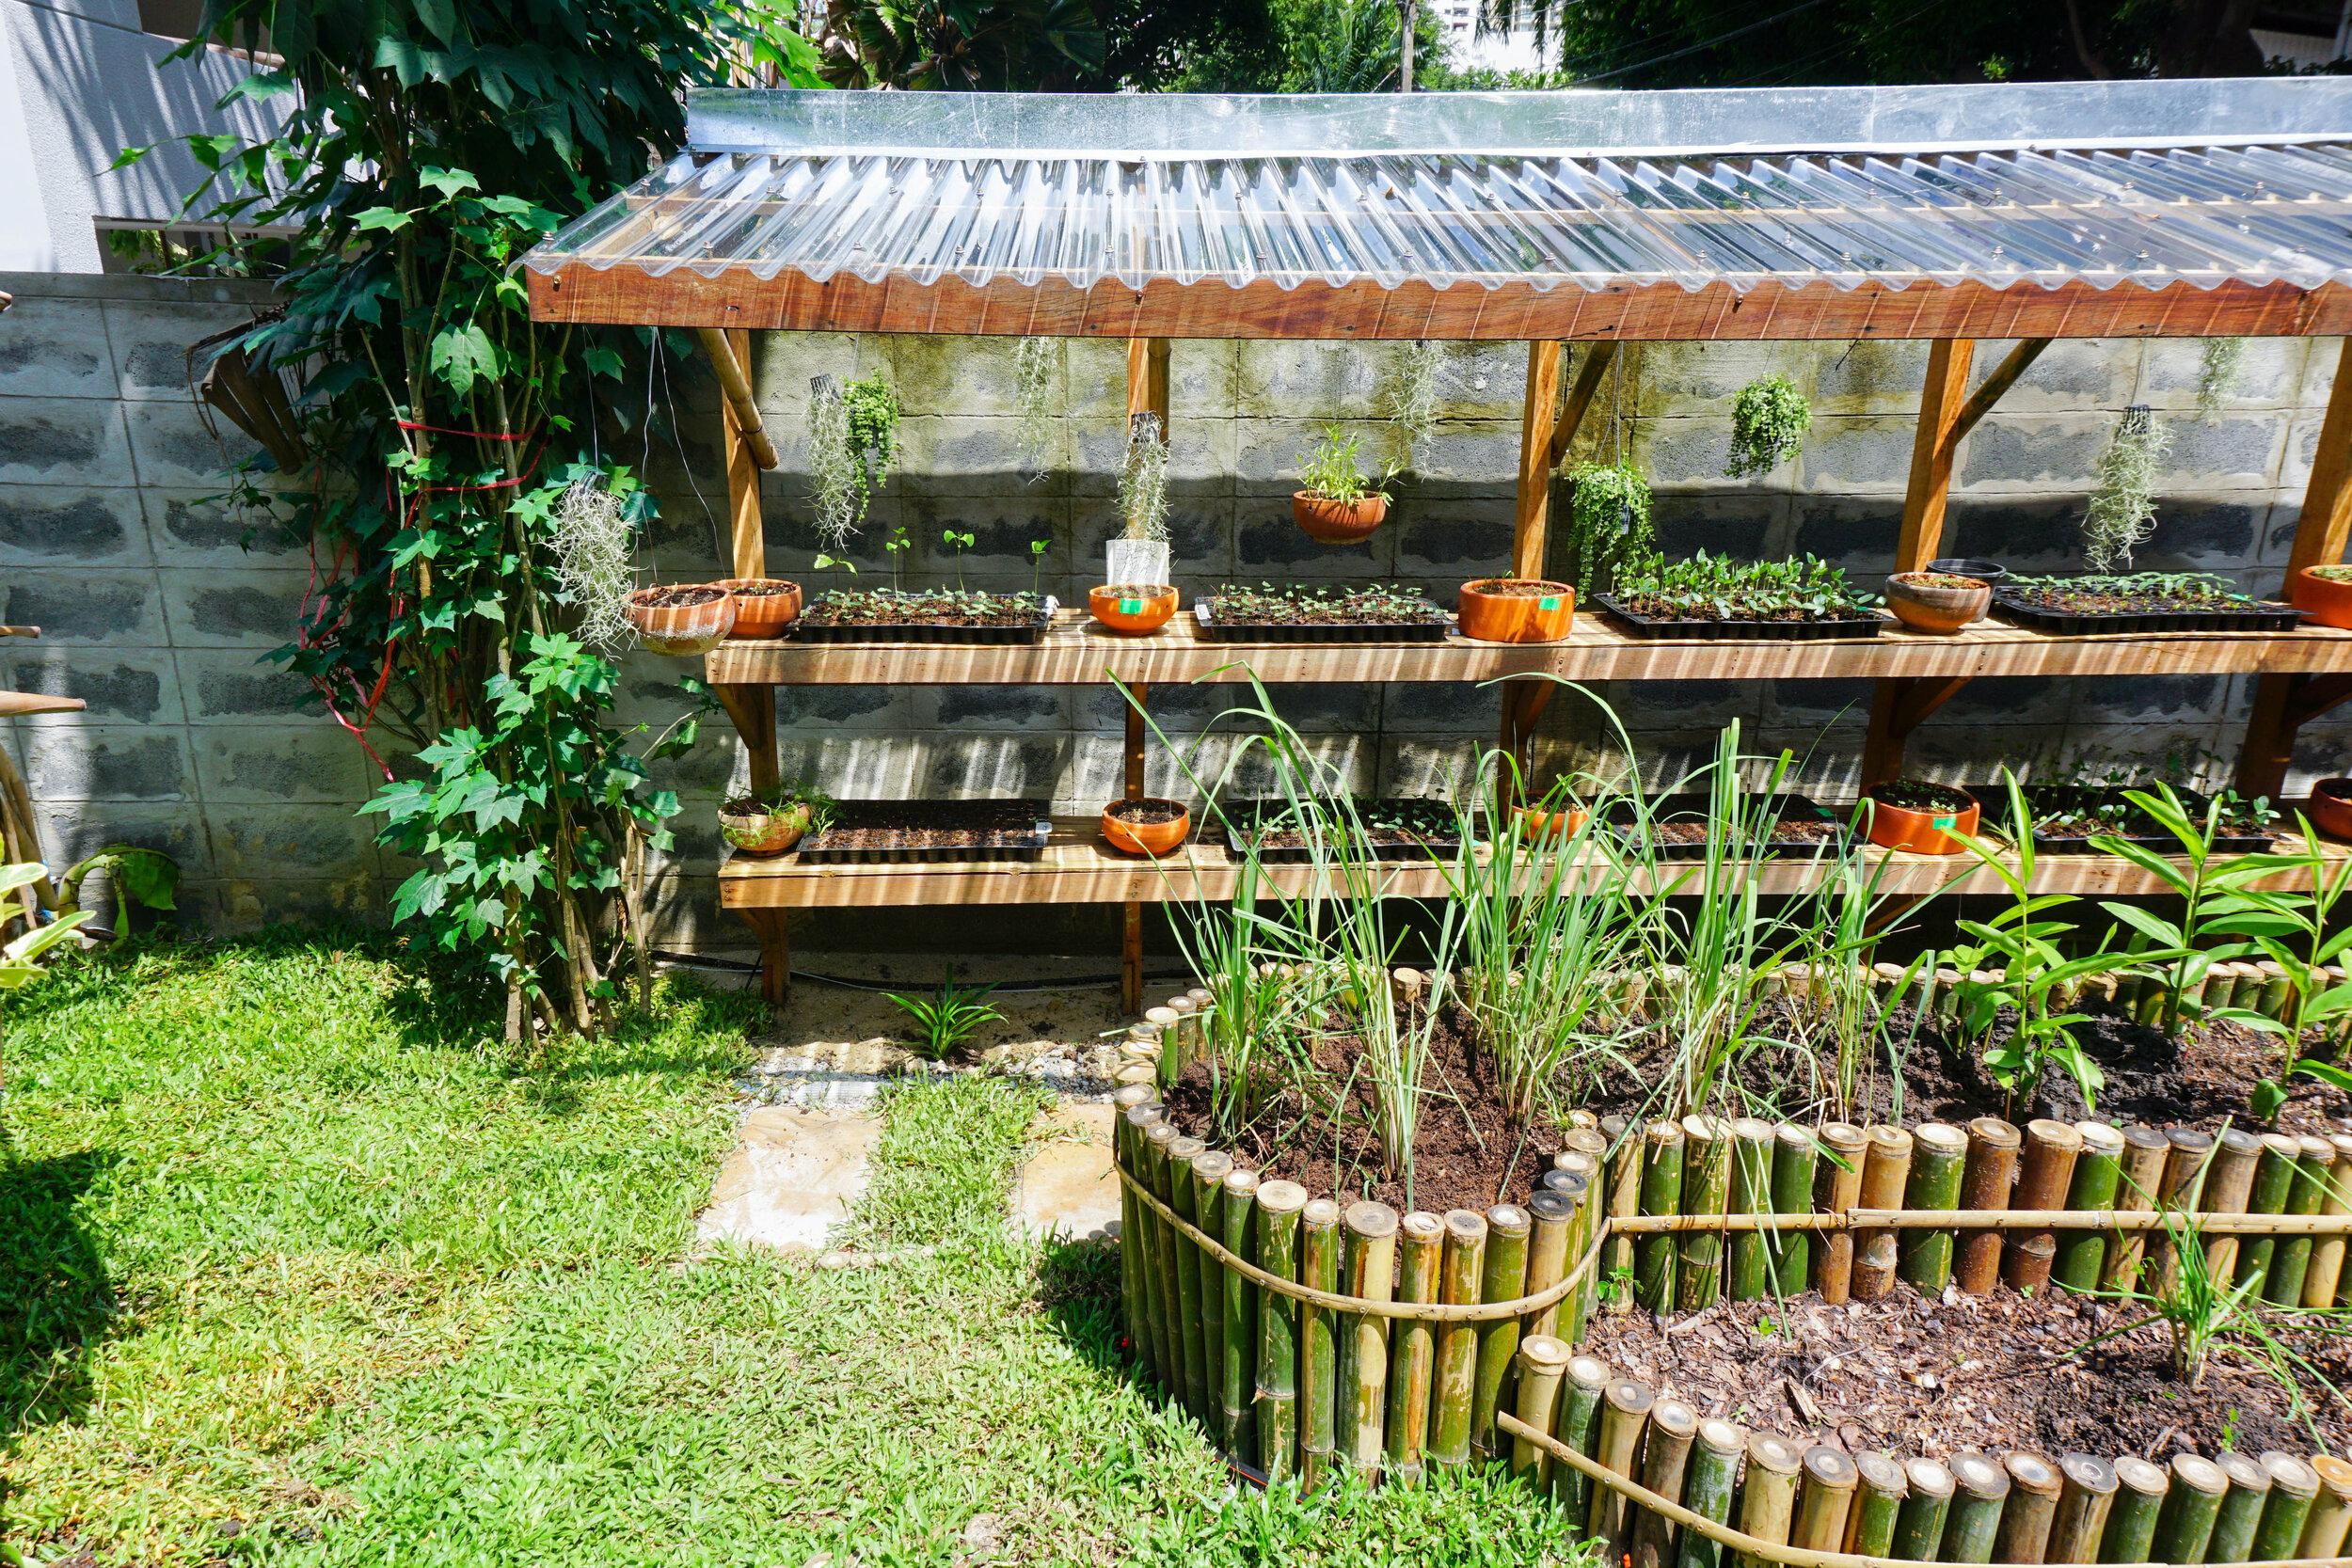 Openspace: Short term harvest plants & plants nursery at the organic garden at Bo.lan, Bangkok